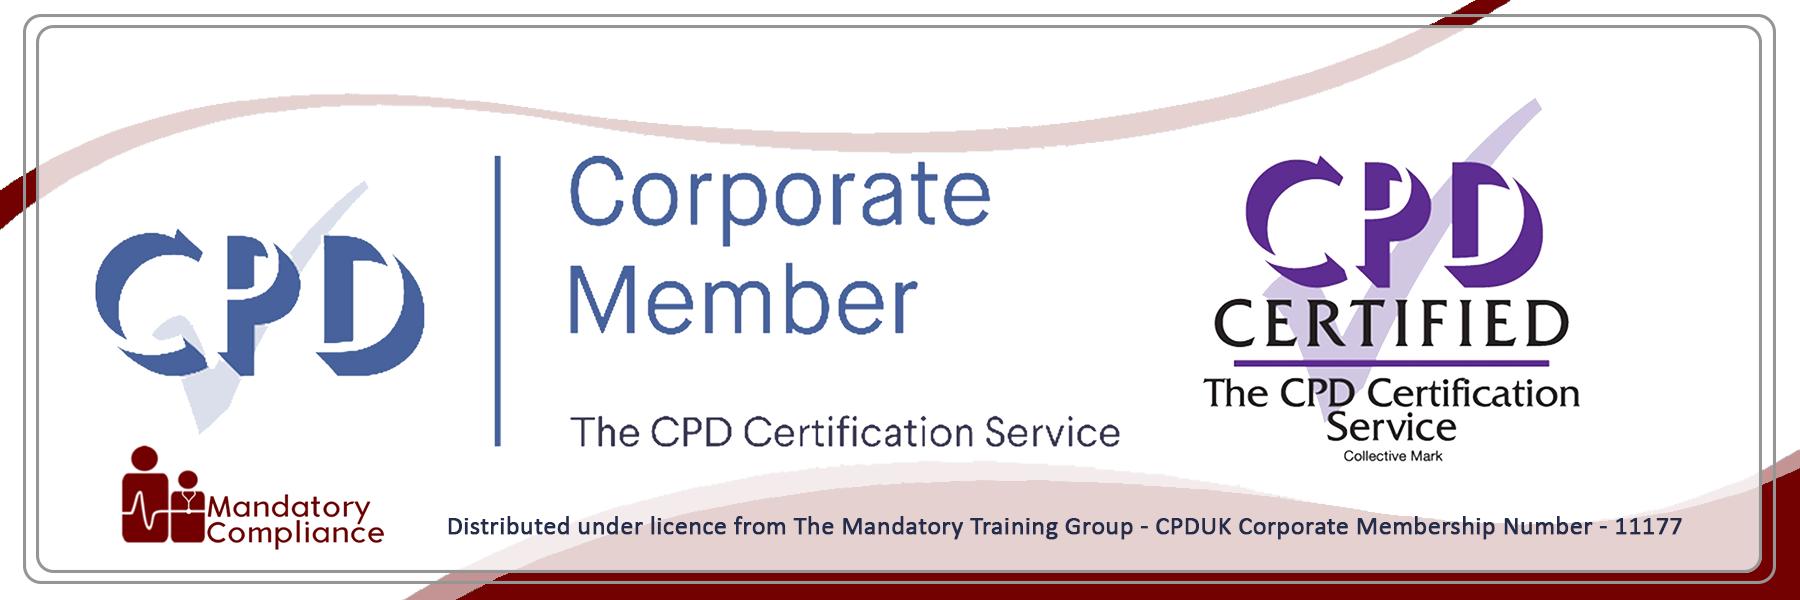 Business Skills - Online Training Package - The Mandatory Training Group UK -